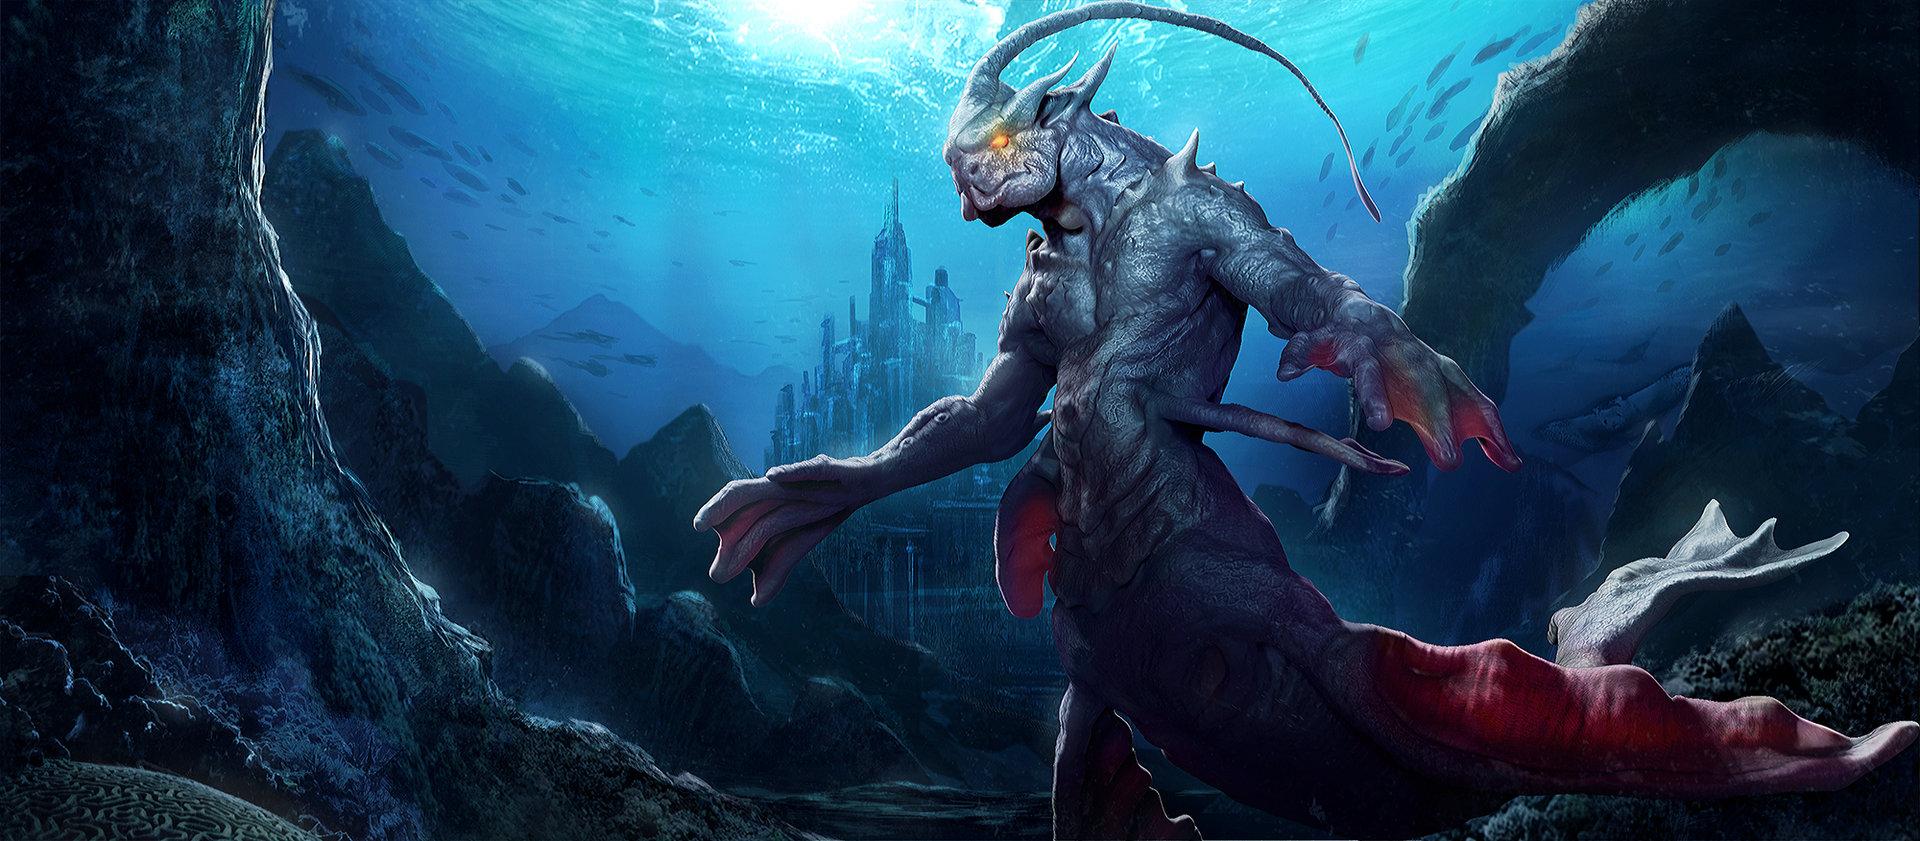 Artstation - Sea Creature Lorenz Basuki